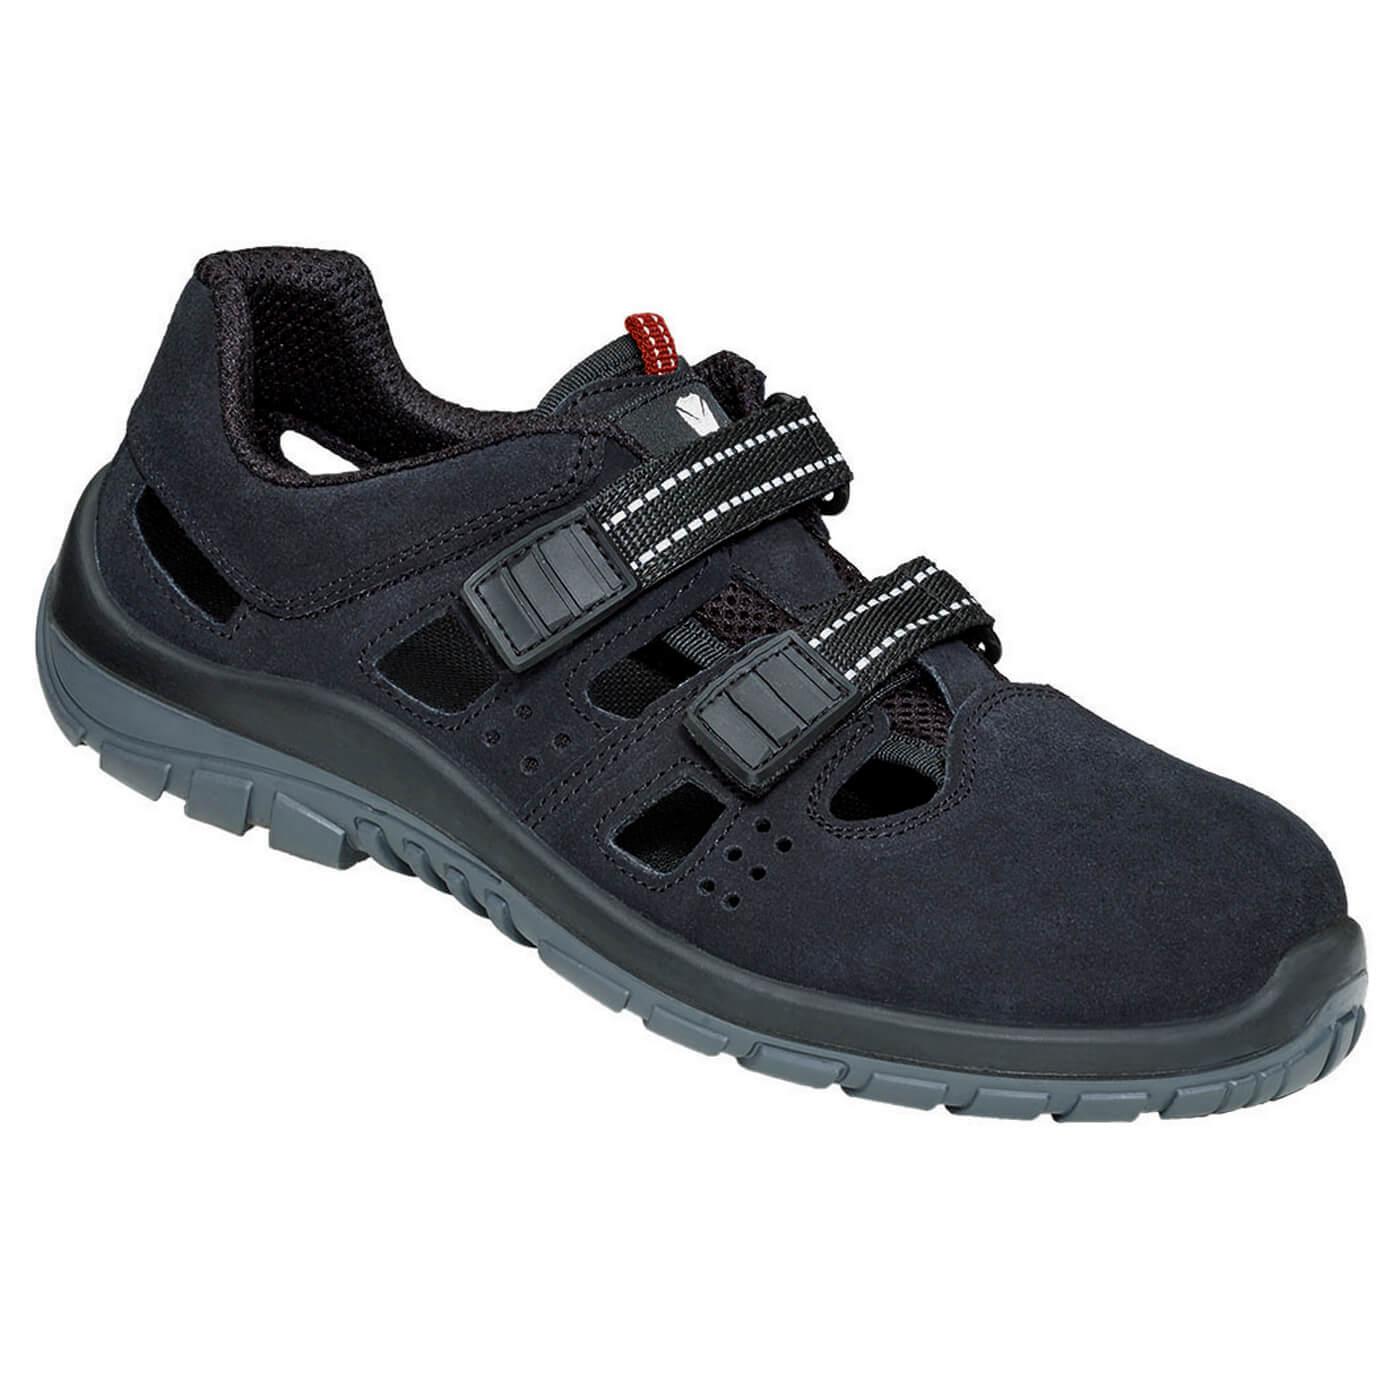 Sandały robocze C140 Maxguard